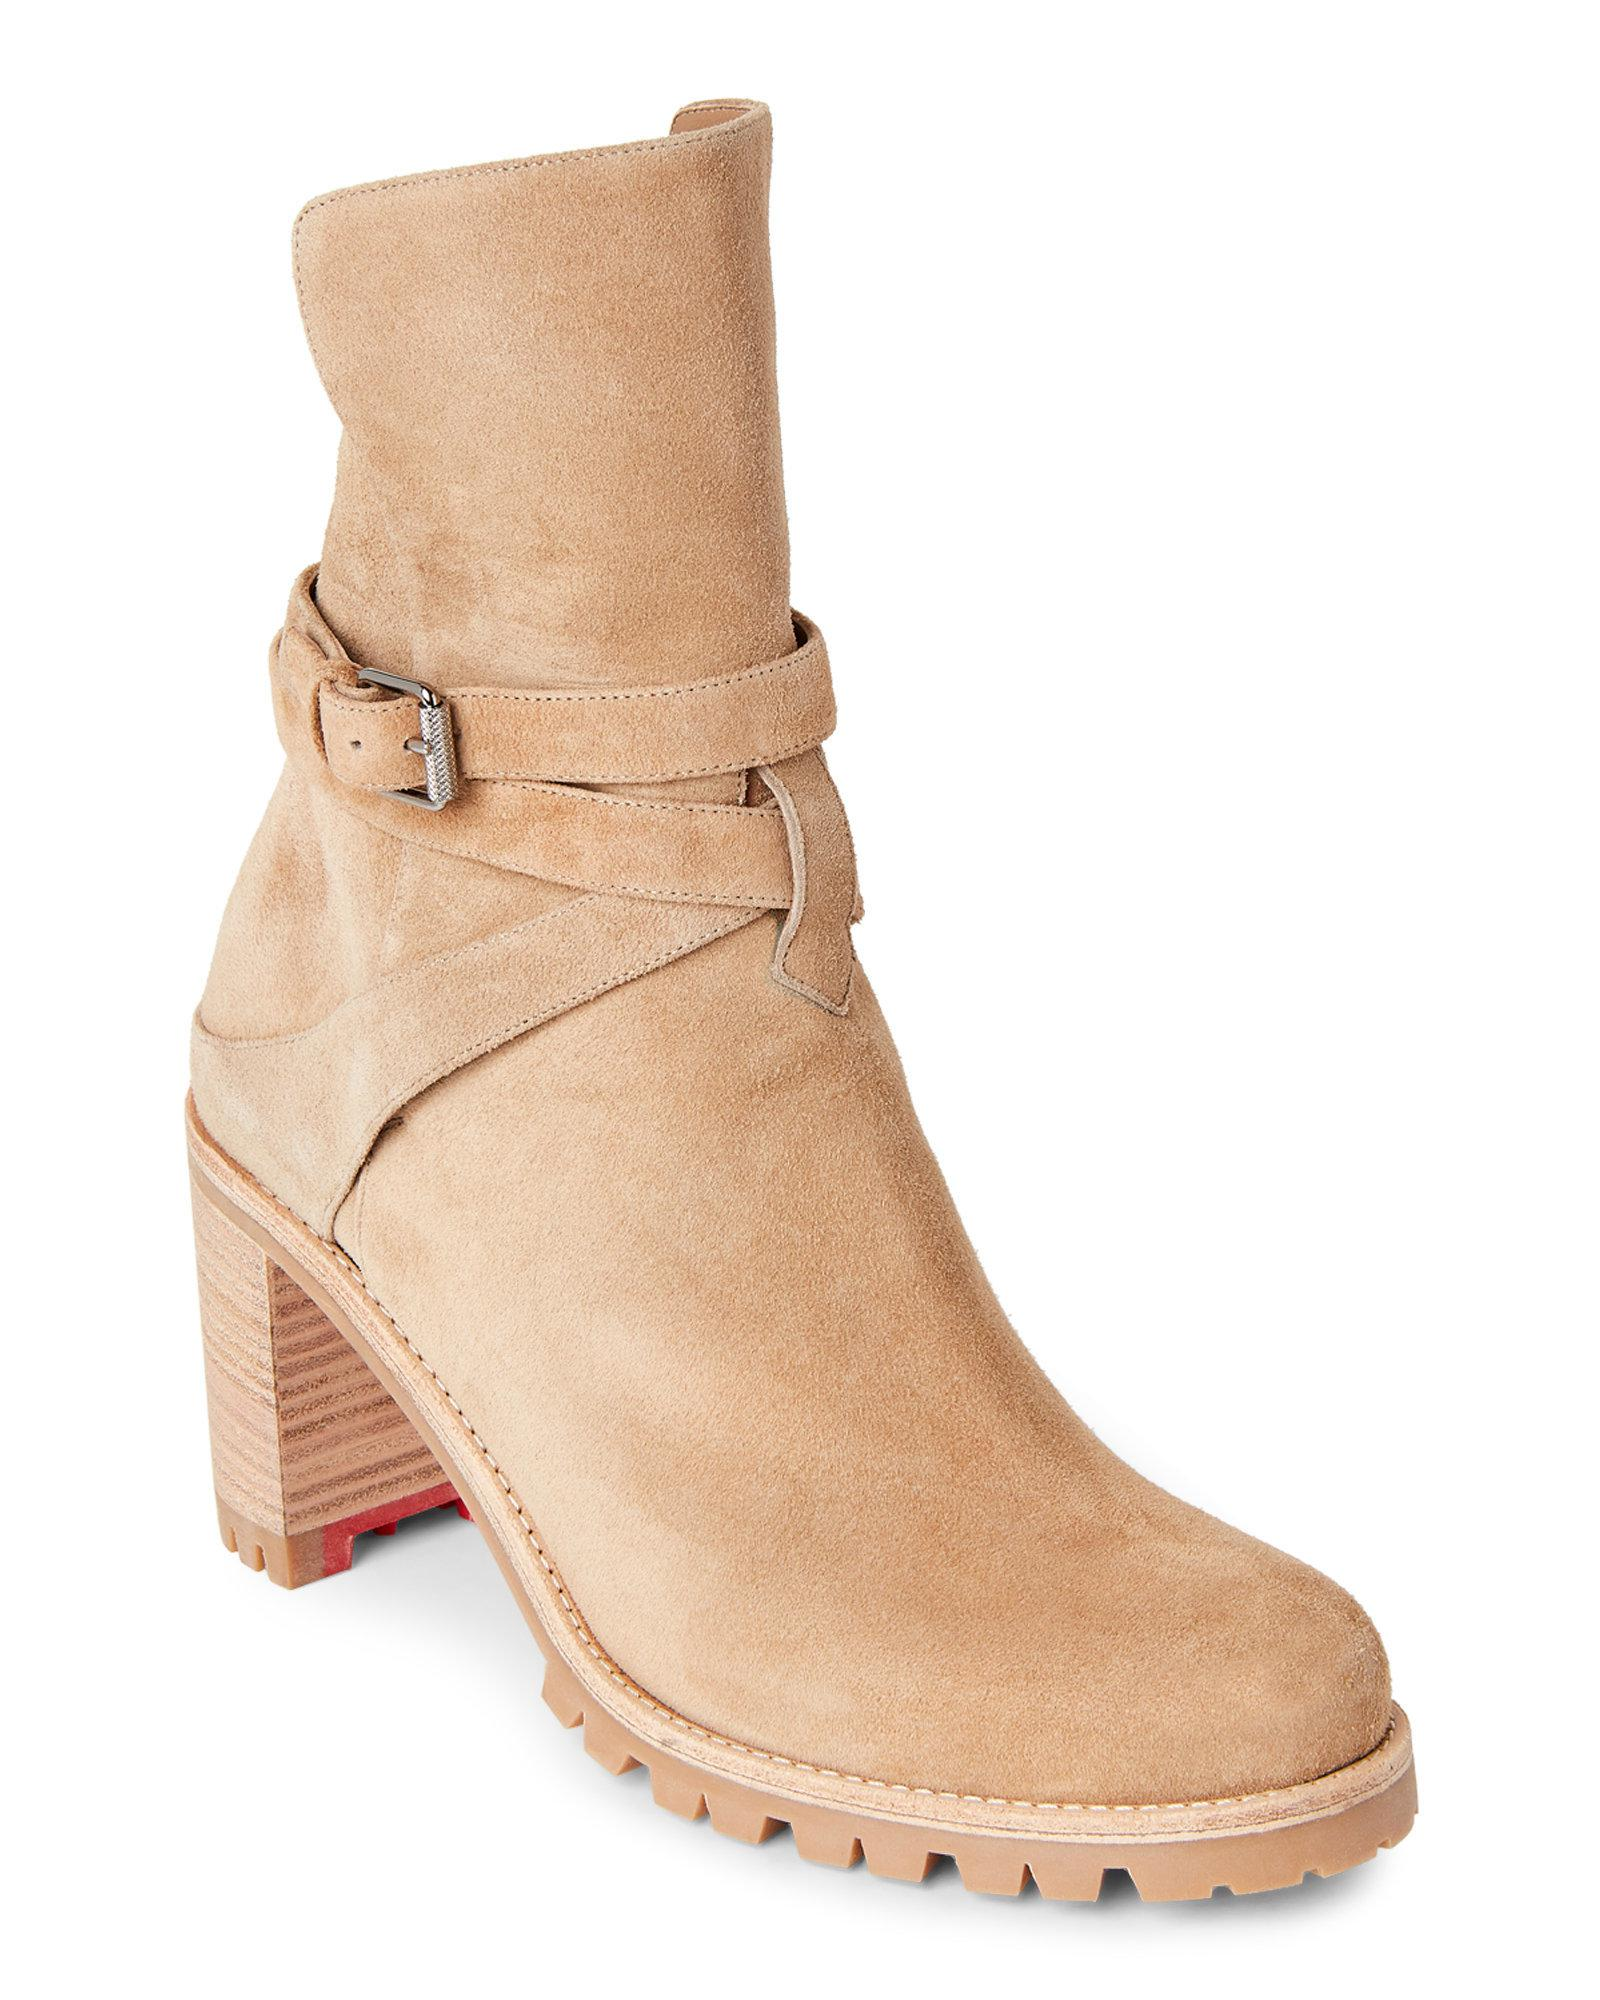 separation shoes c8420 ff451 Christian Louboutin Natural Karistrap Block Heel Booties